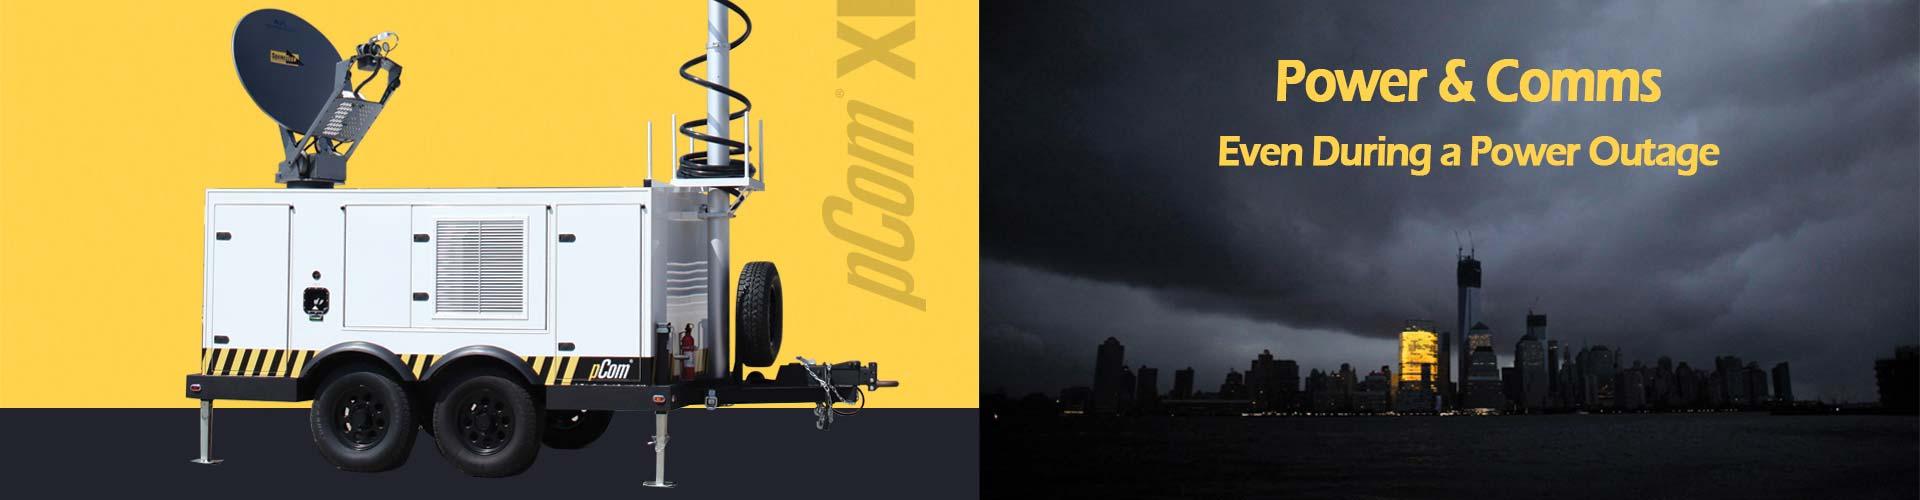 Hurricane Mobile Responder Unit